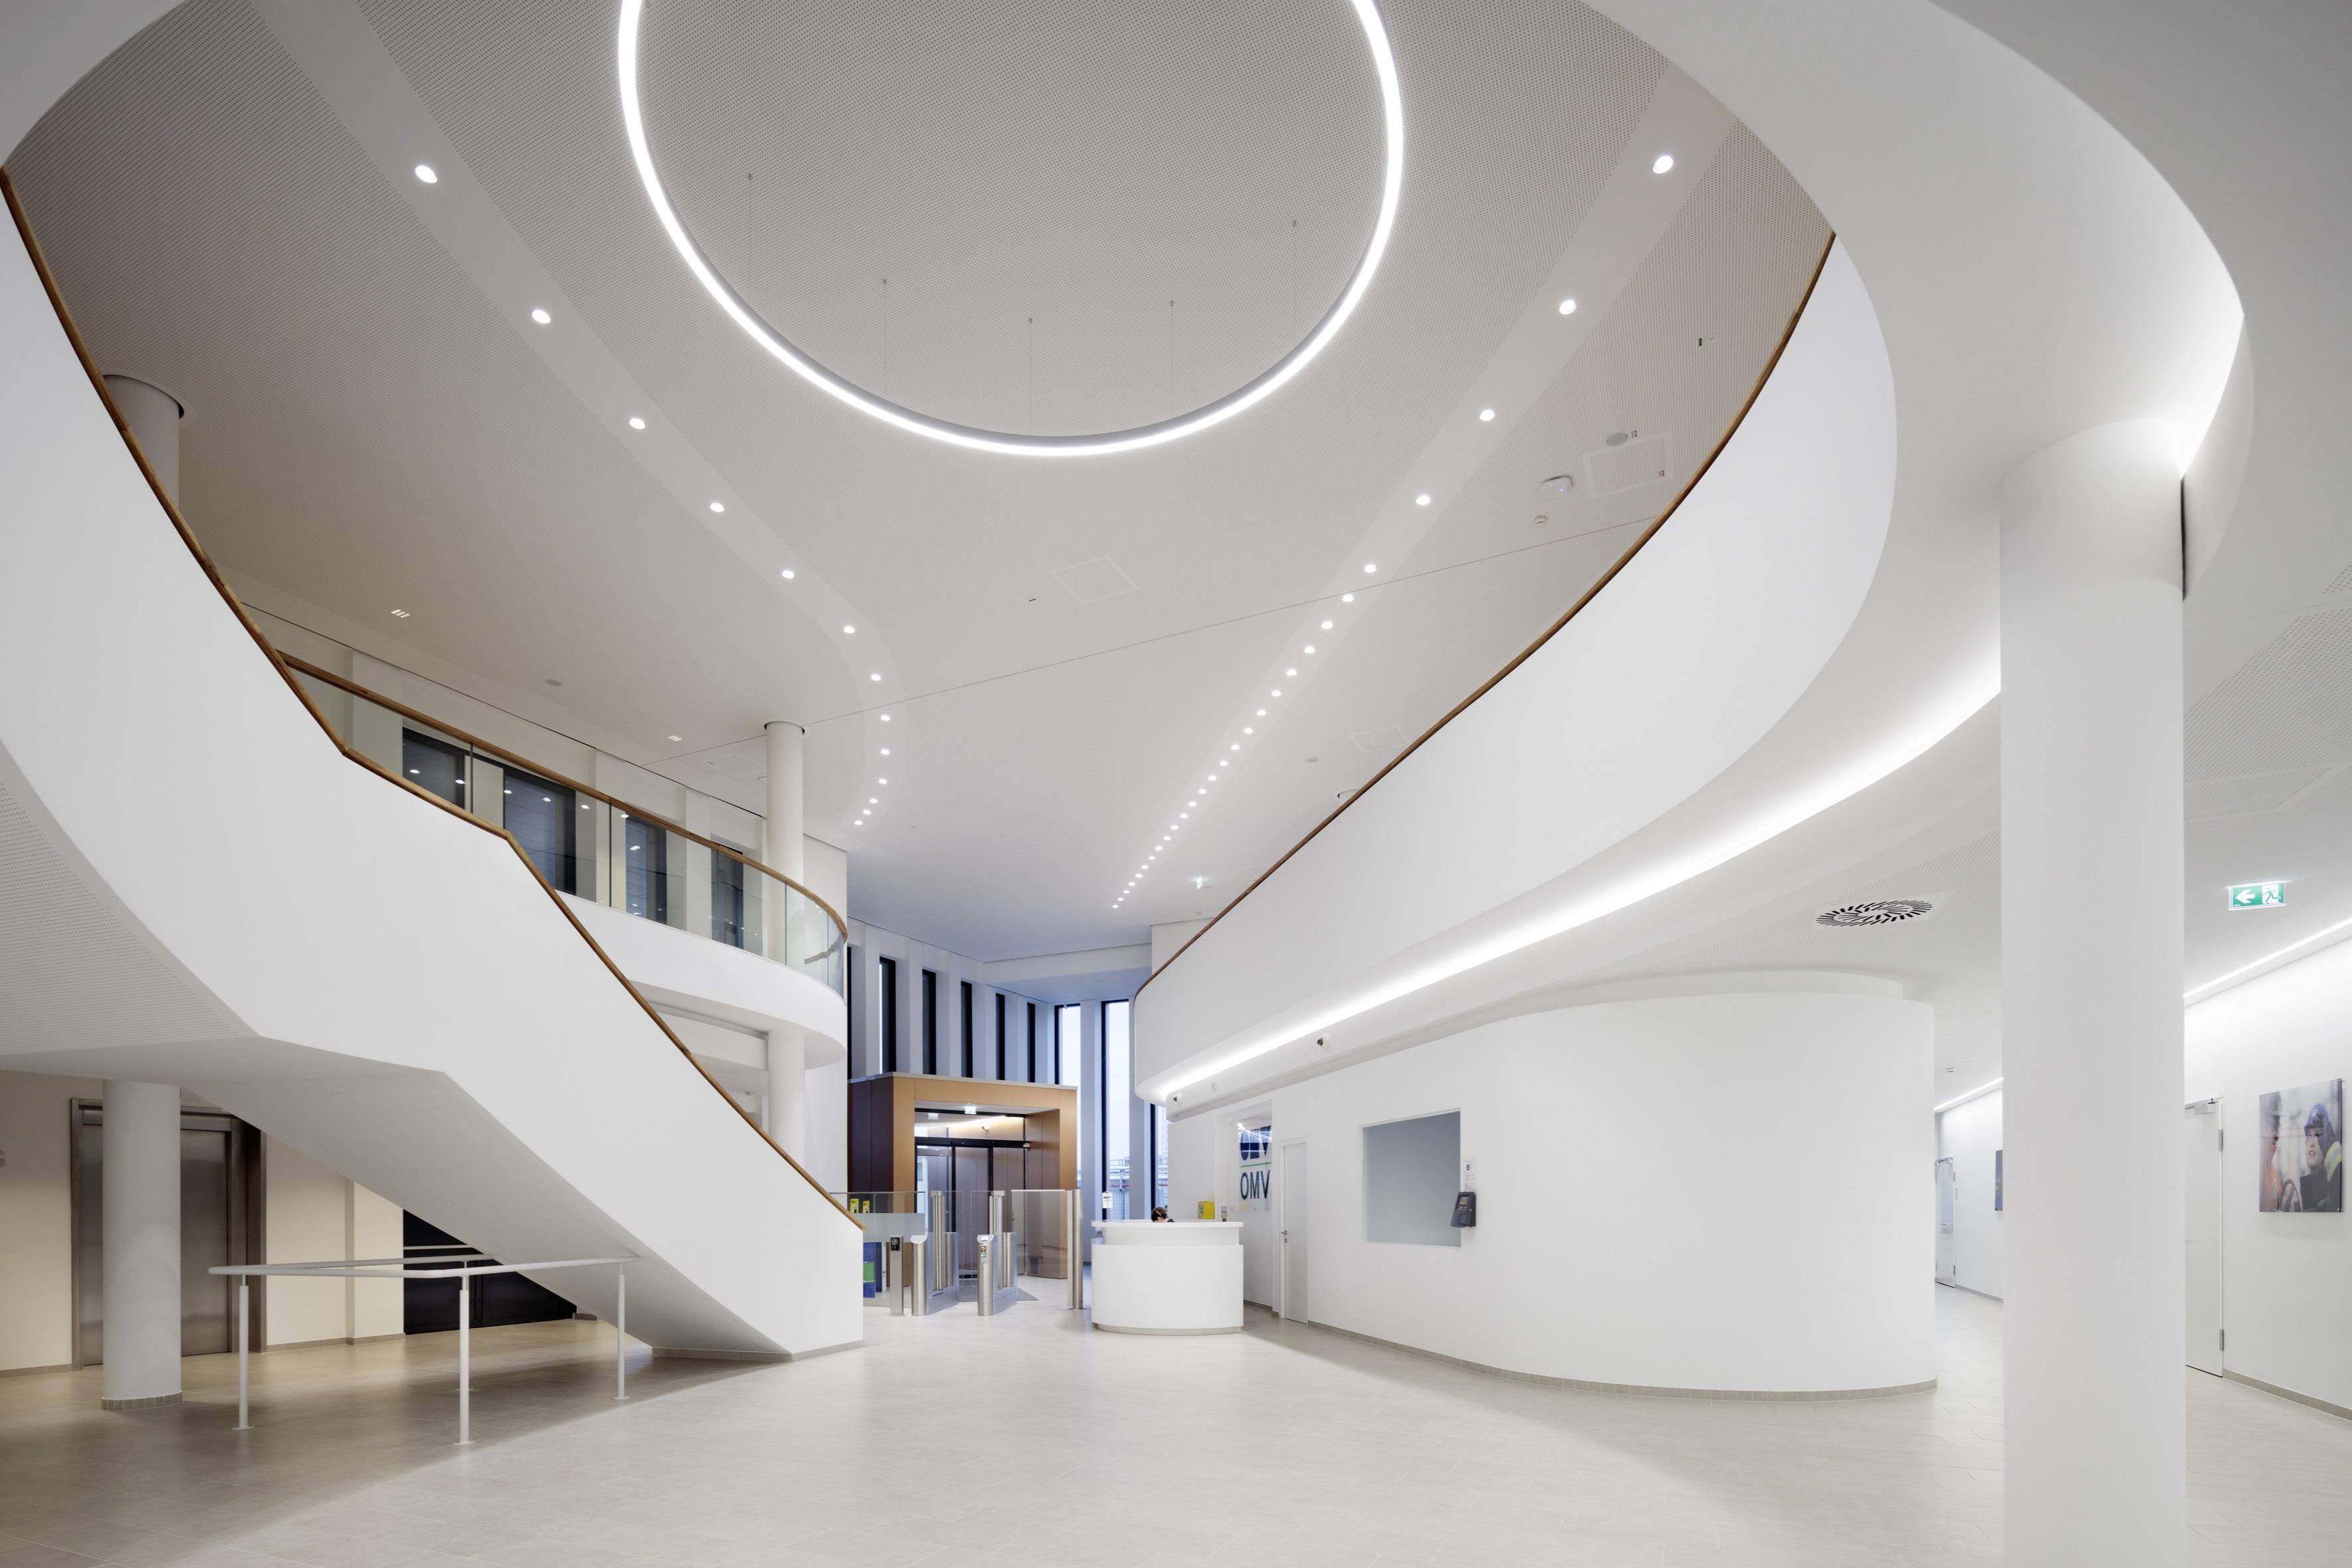 Innenraum, Entrée.<br>Integrale Planung von ATP architekten ingenieure (Wien)<br><span class='image_copyright'>ATP/Kuball</span><br>